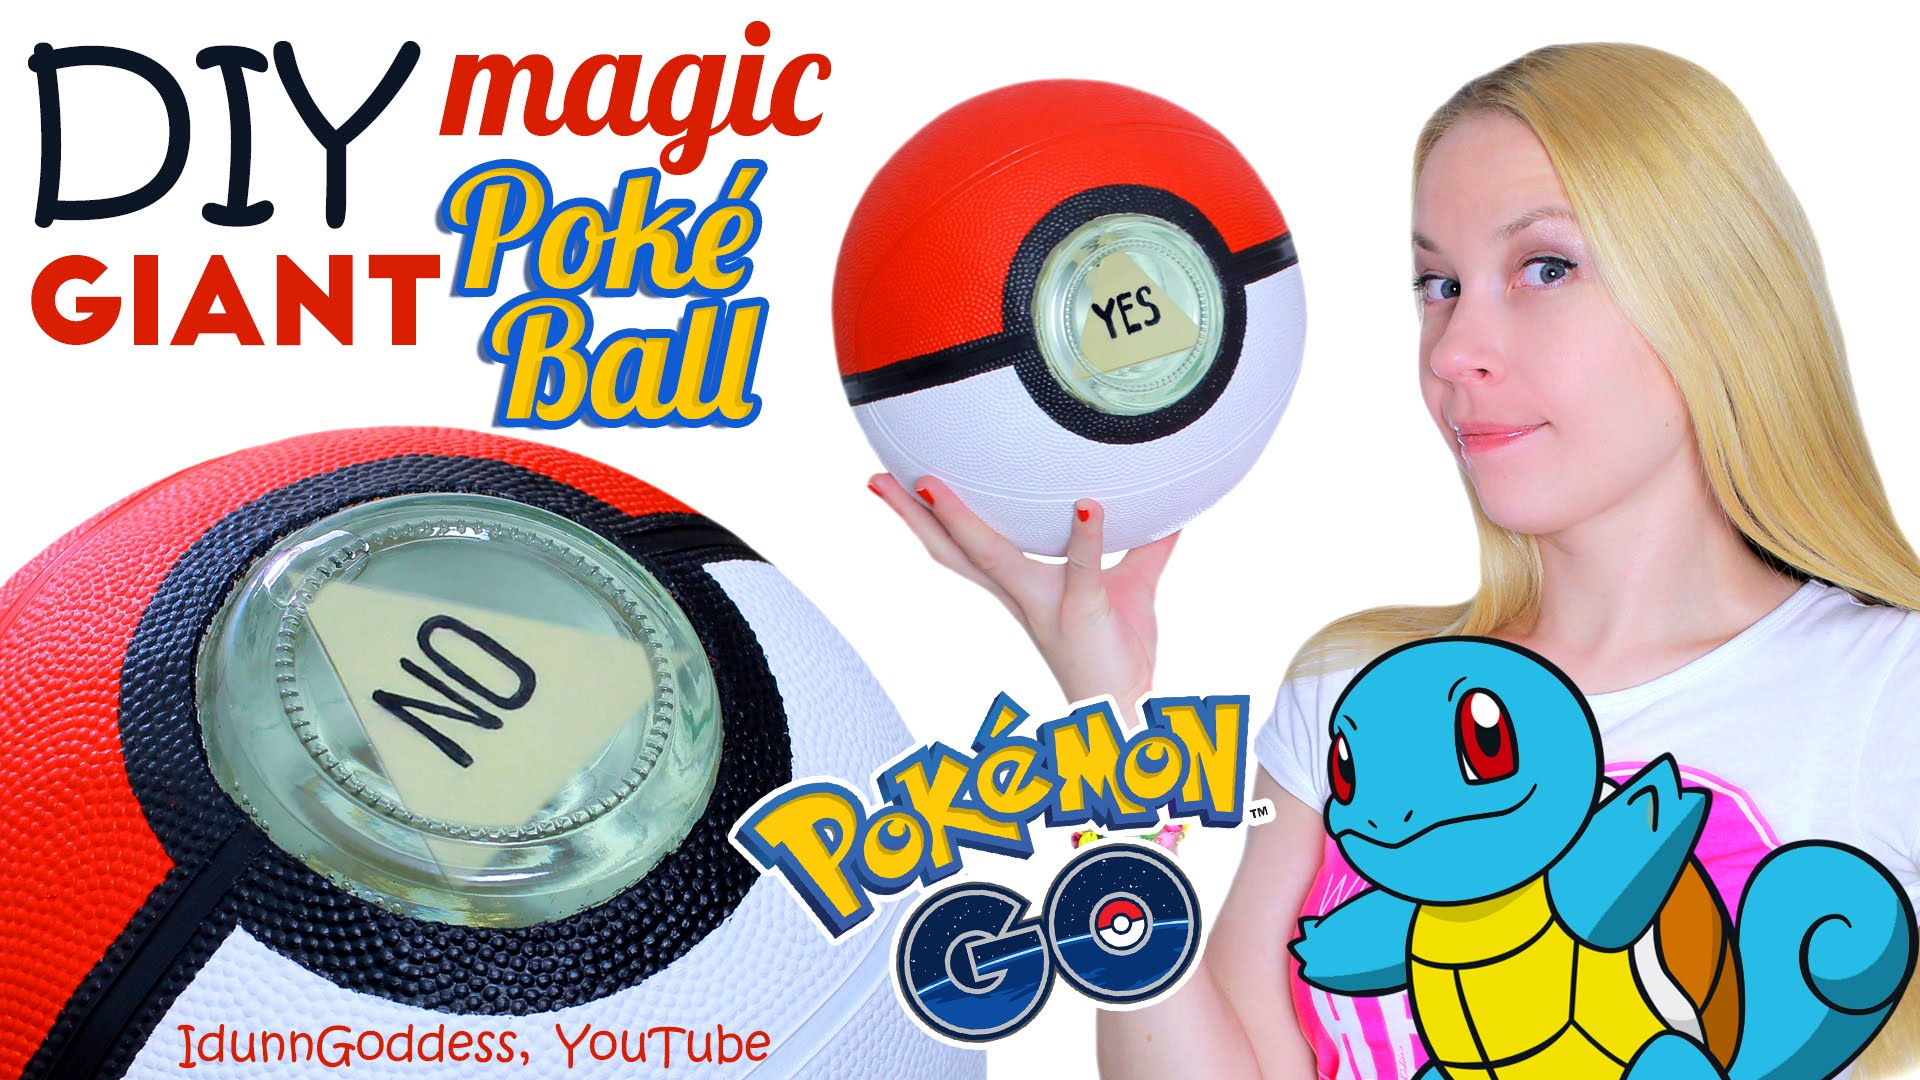 Drawn pokeball basketball Ball Pokemon GIANT Poke DIY